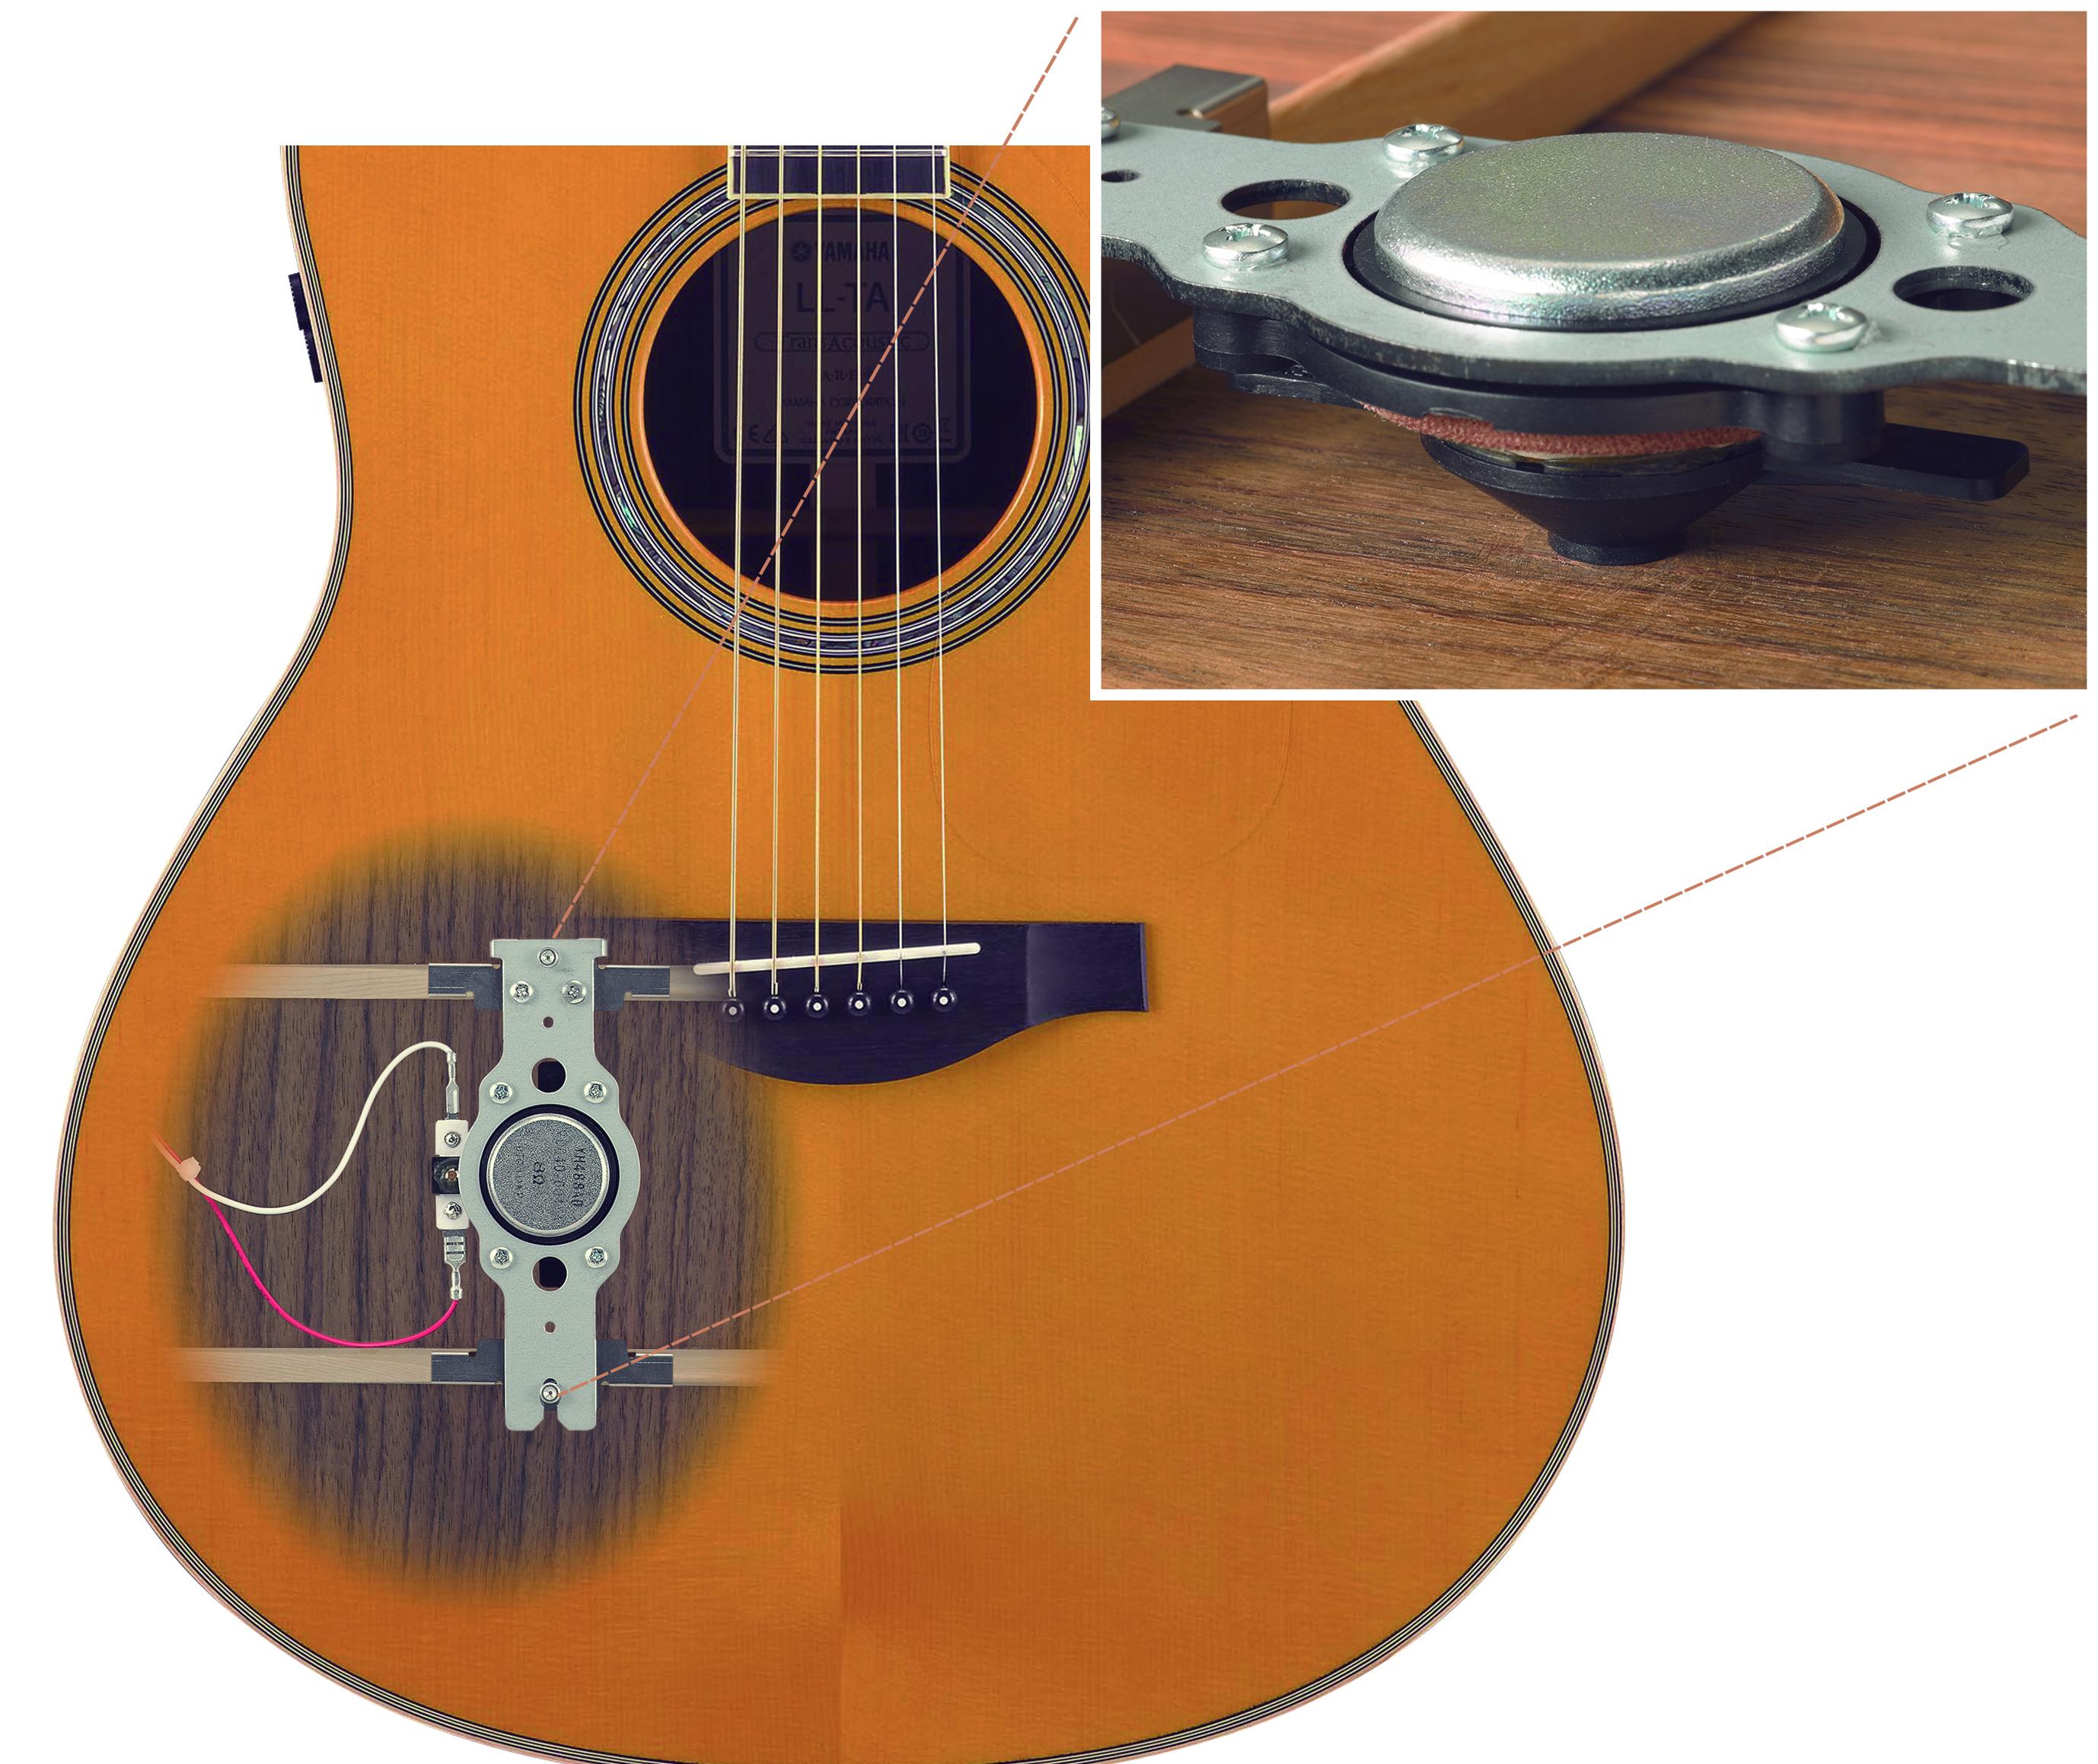 WRG-6273] Resonator Electric Guitar Wiring Diagram on